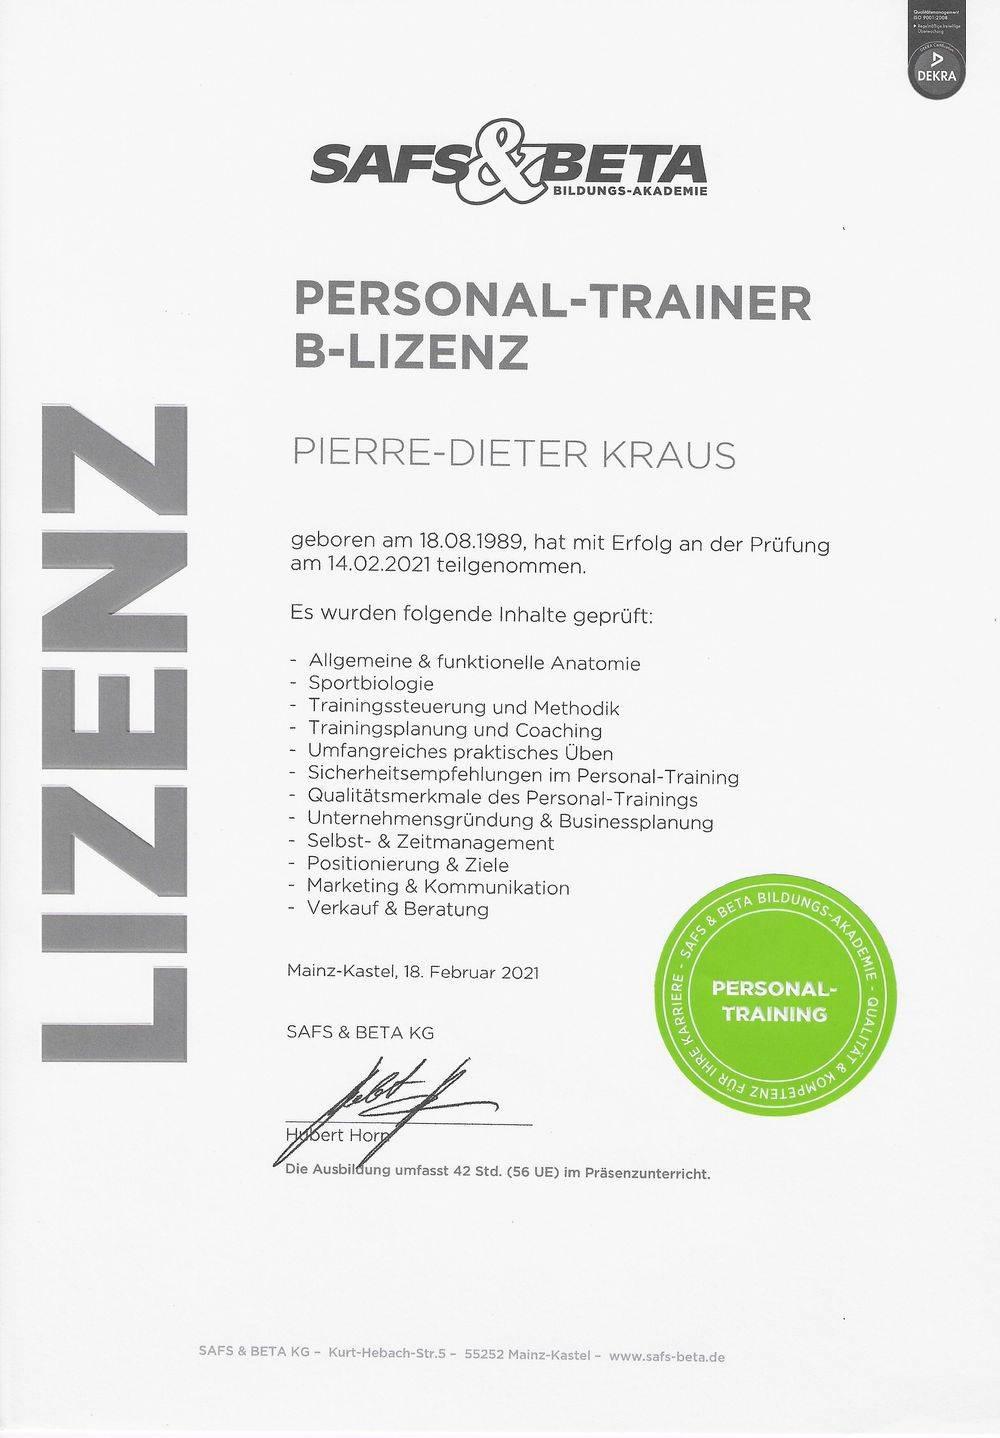 Personal Trainer B-Lizenz